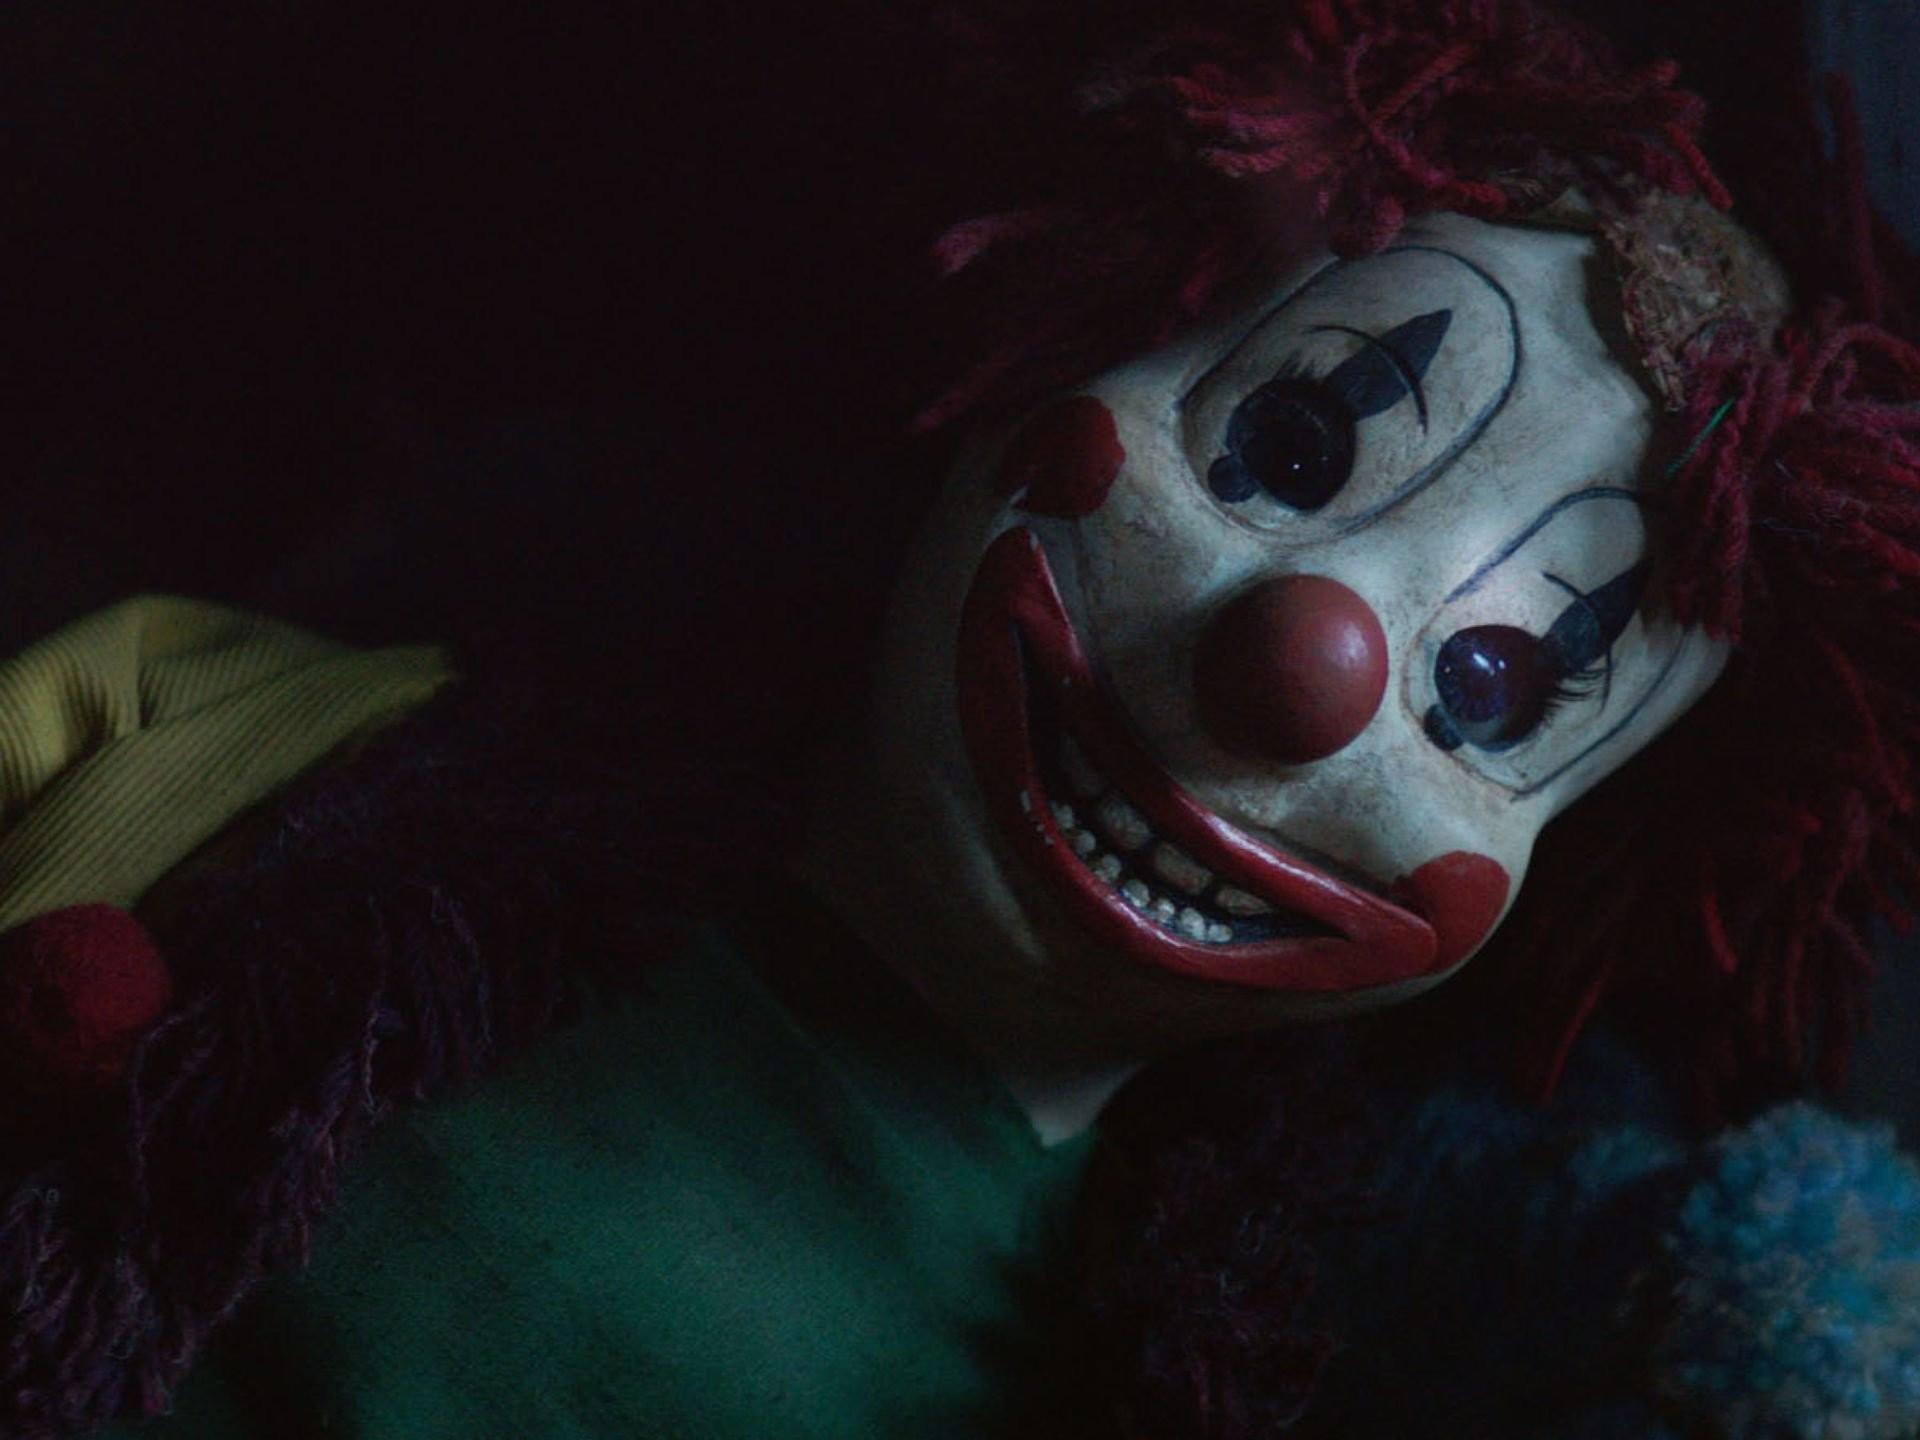 Evil clown wallpaper 63 images - Circus joker wallpaper ...